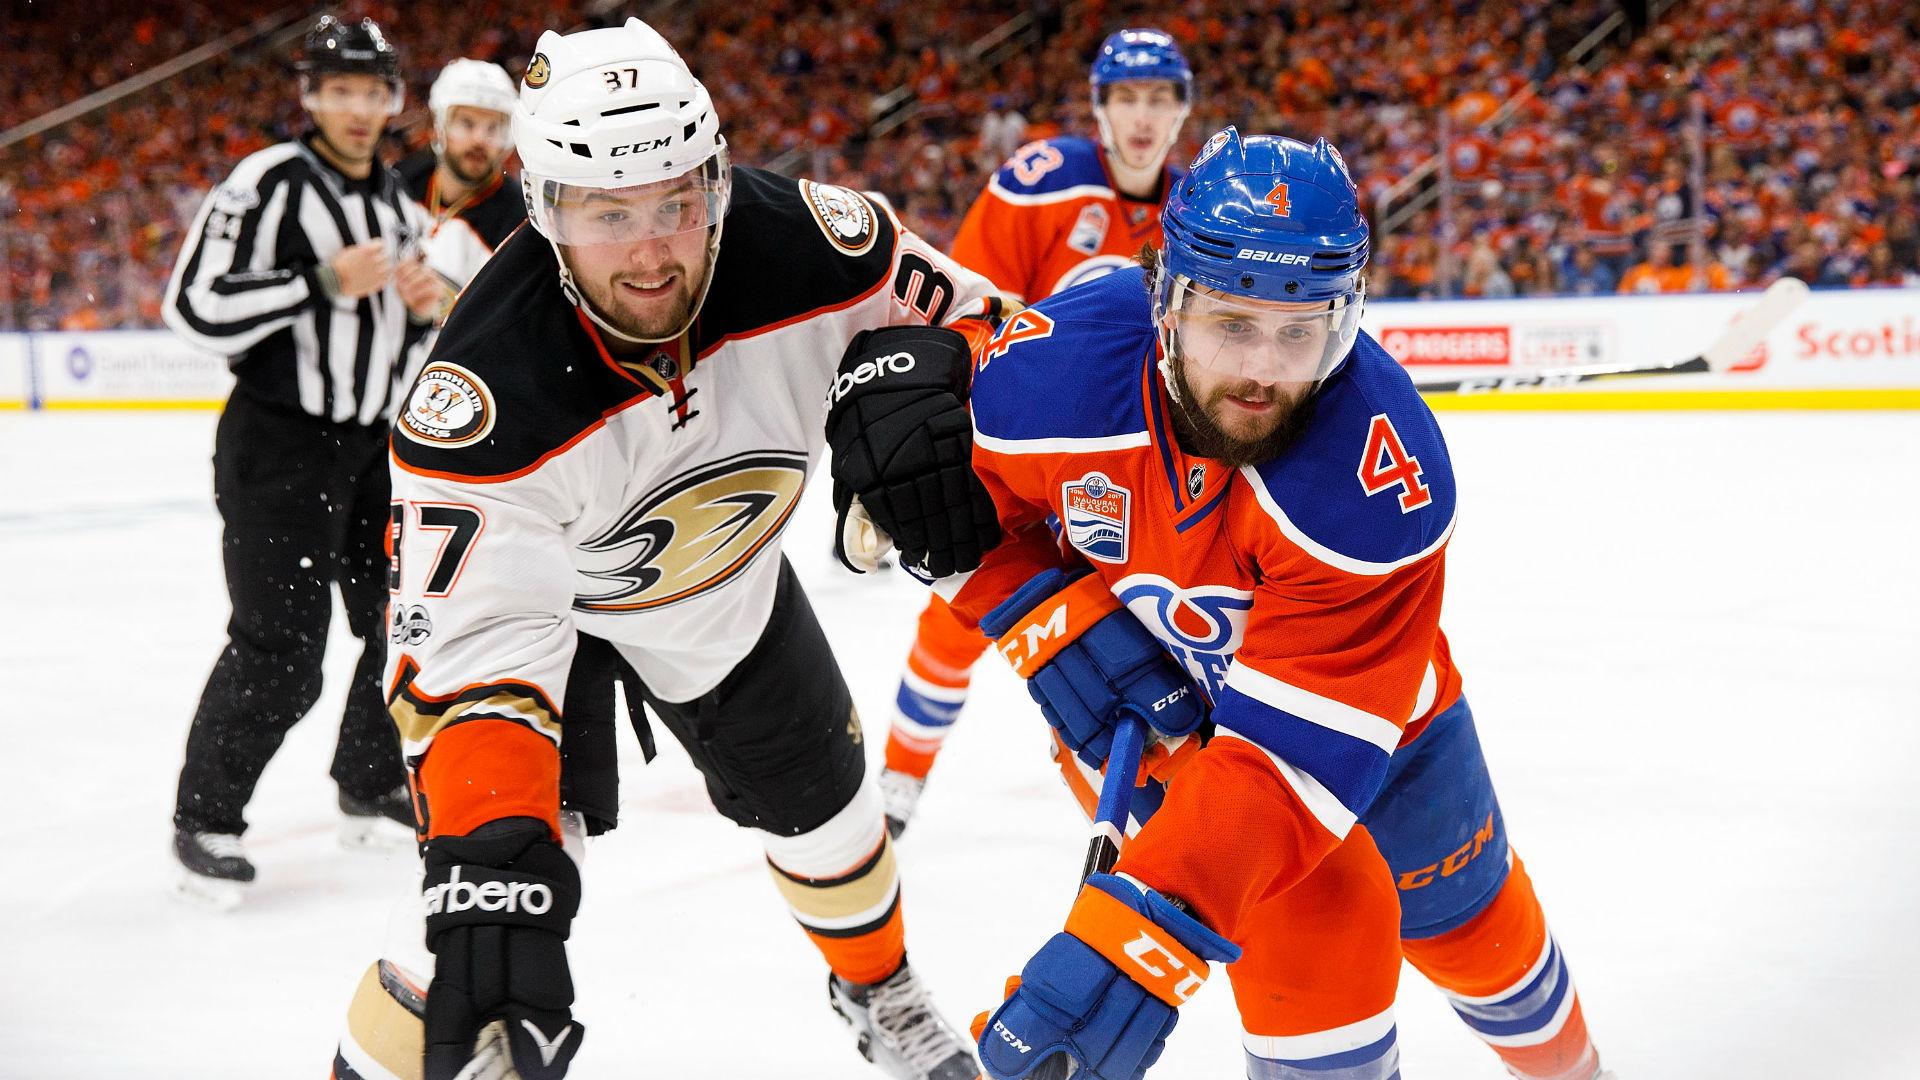 Ducks seeking to avoid 0-2 hole vs. Predators